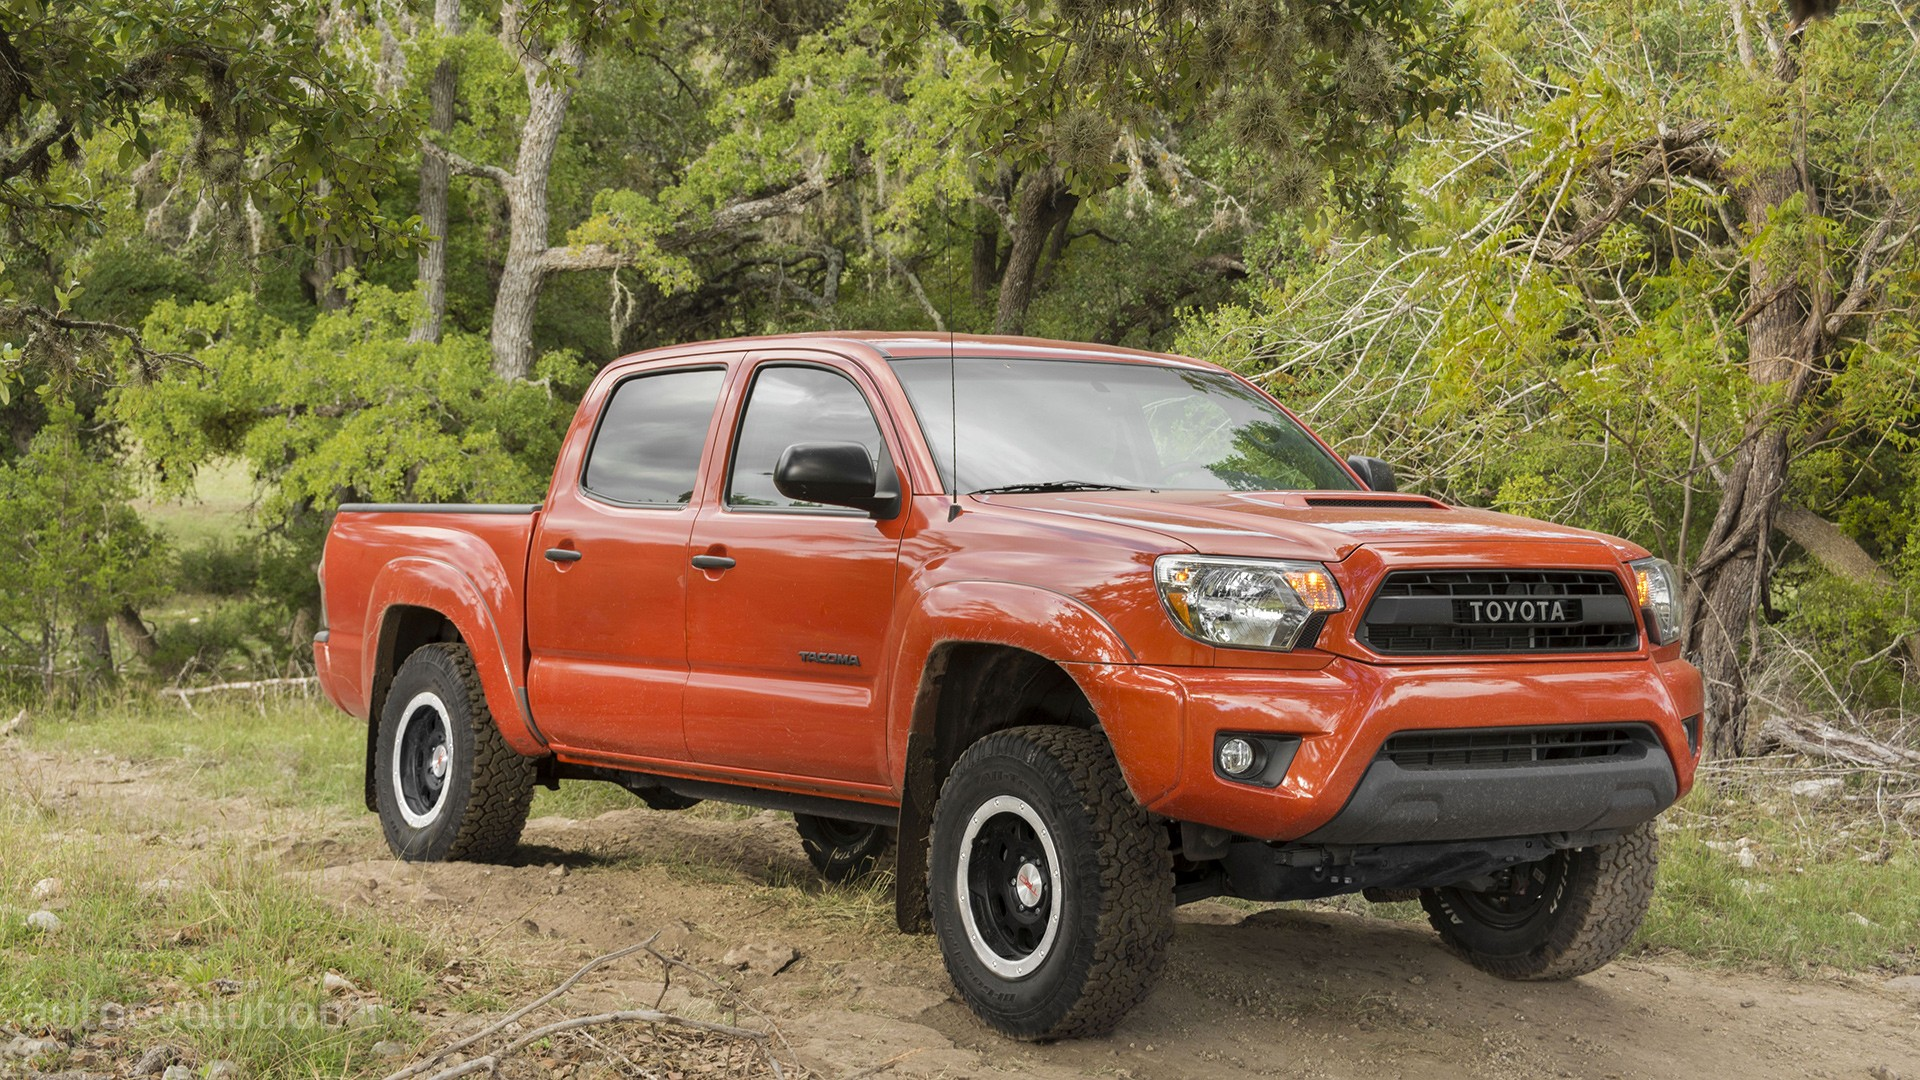 Toyota Tacoma Evolution >> 2015 Toyota Tacoma TRD Pro Review - autoevolution